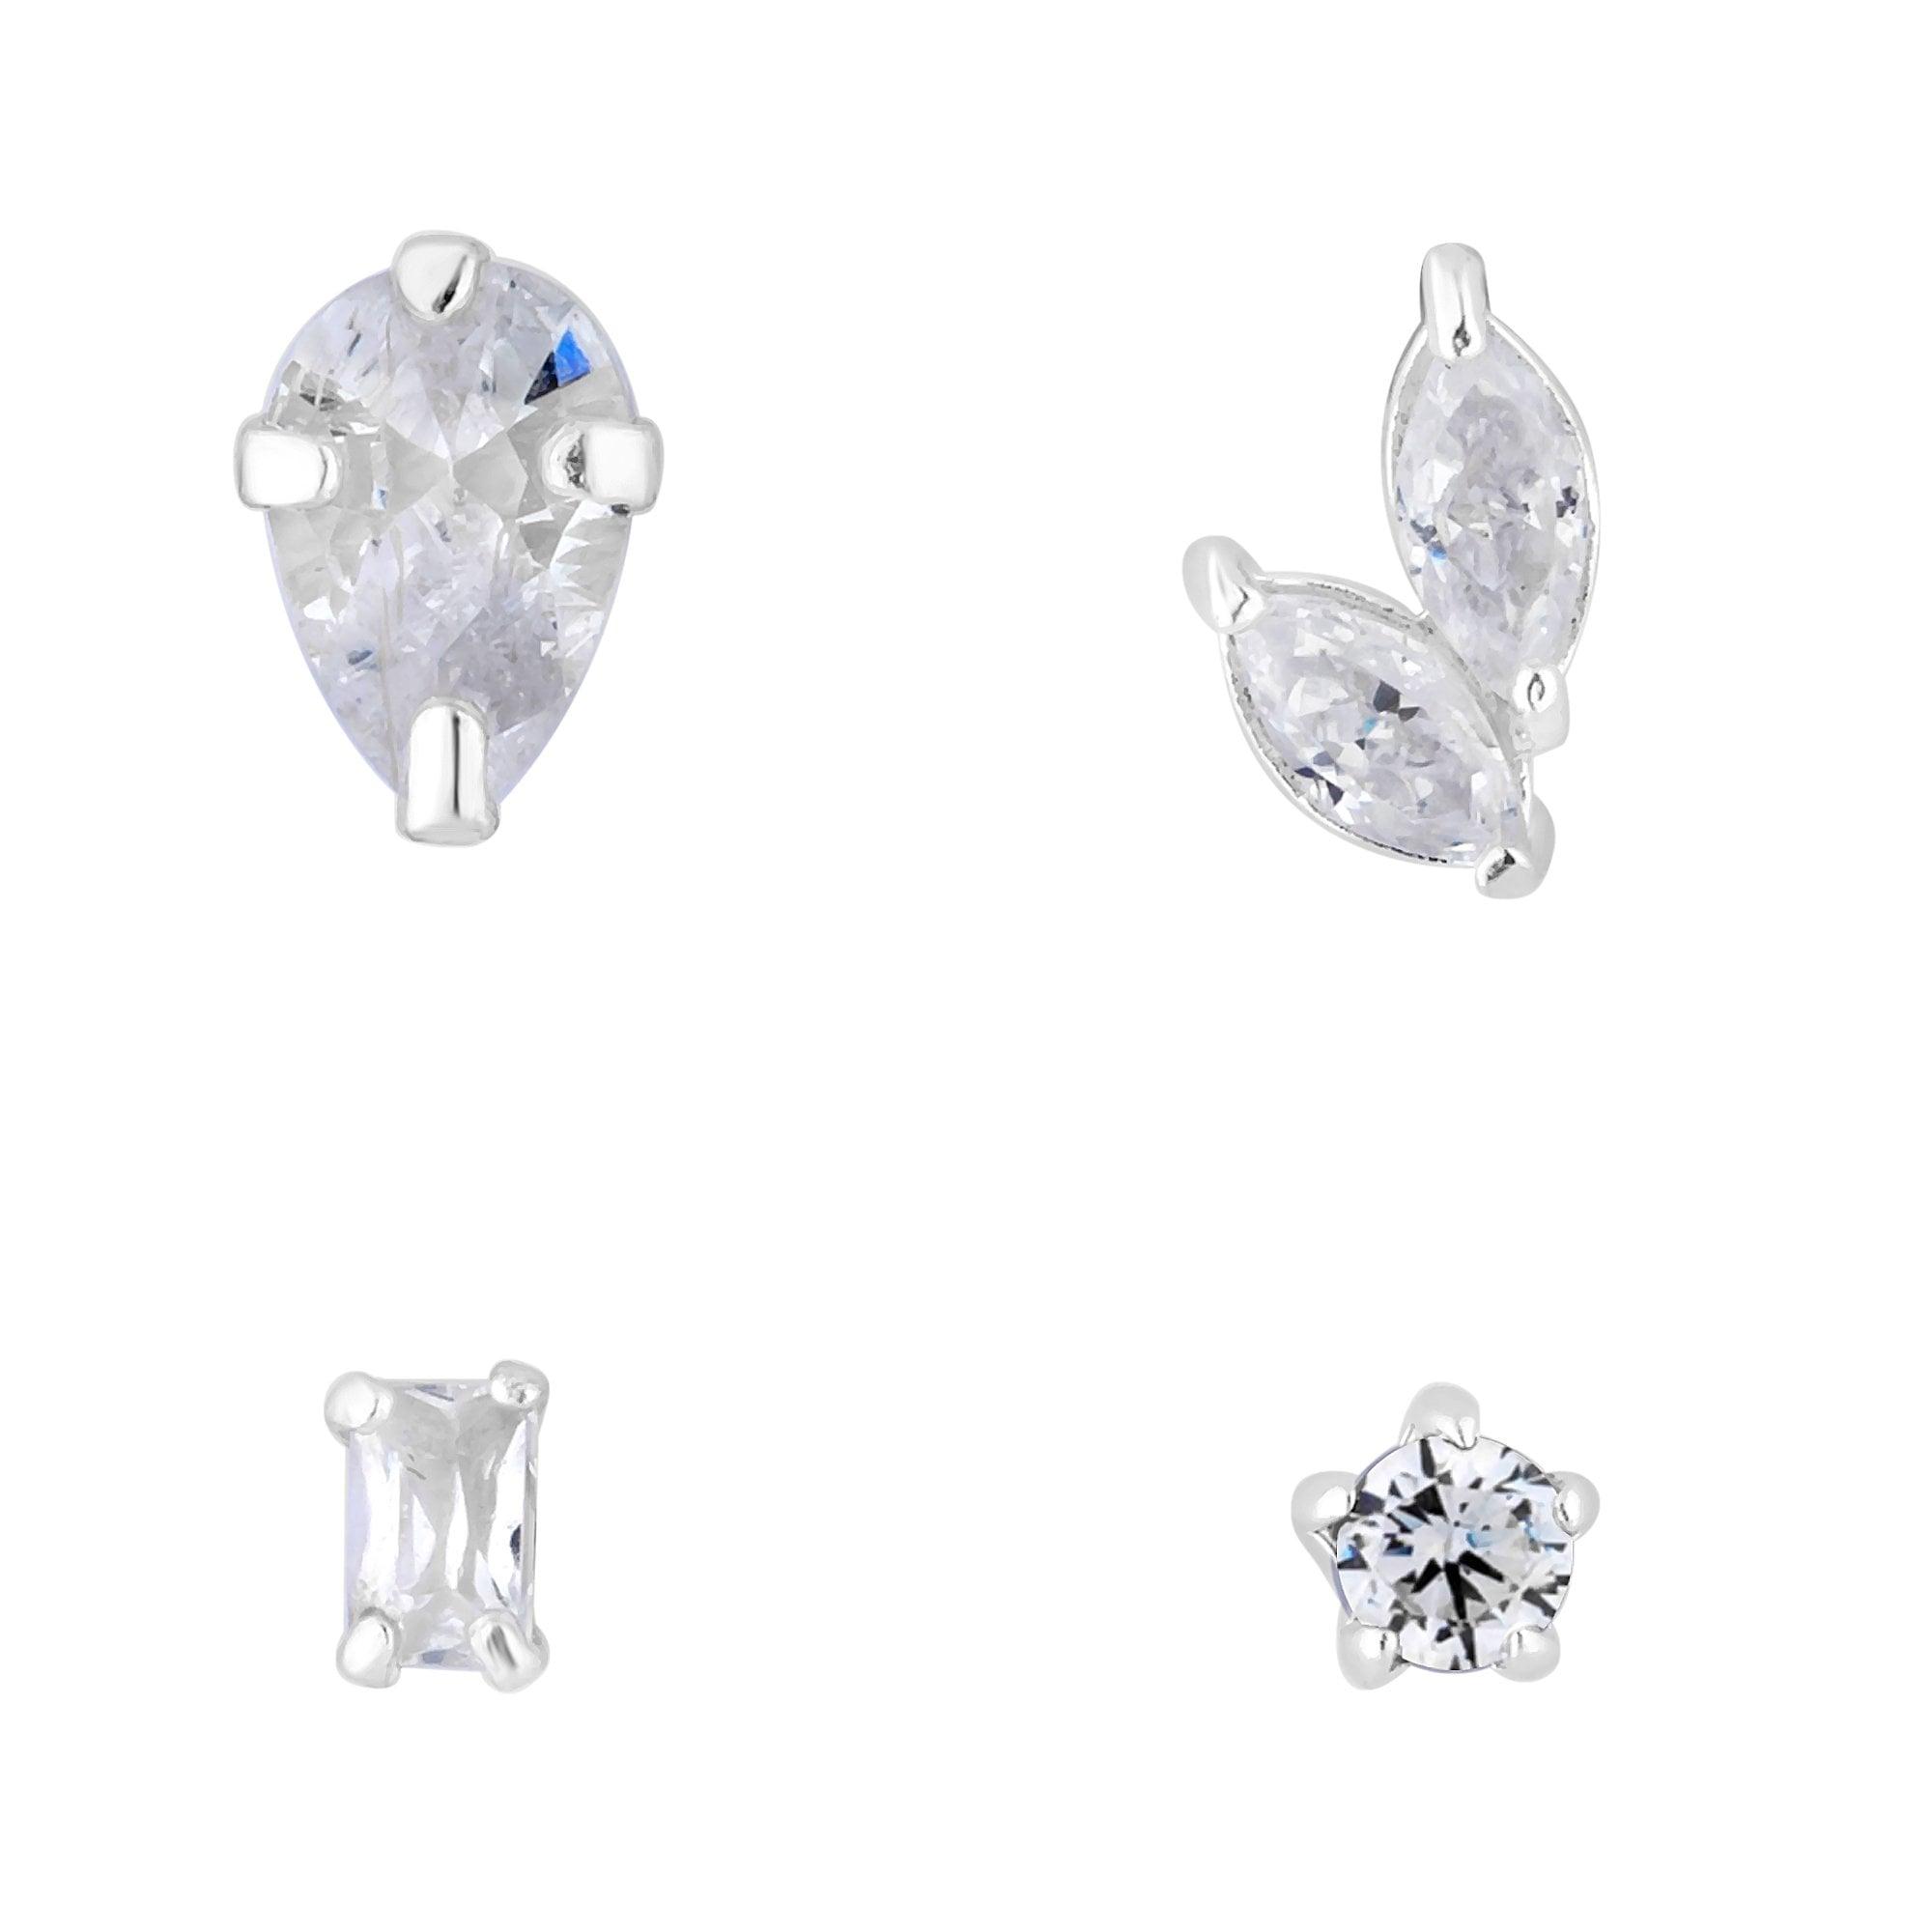 5ba4e00b8 Simply Silver Sterling Silver 925 4 Pack Mismatch Earring Multi Cubic  Zirconia